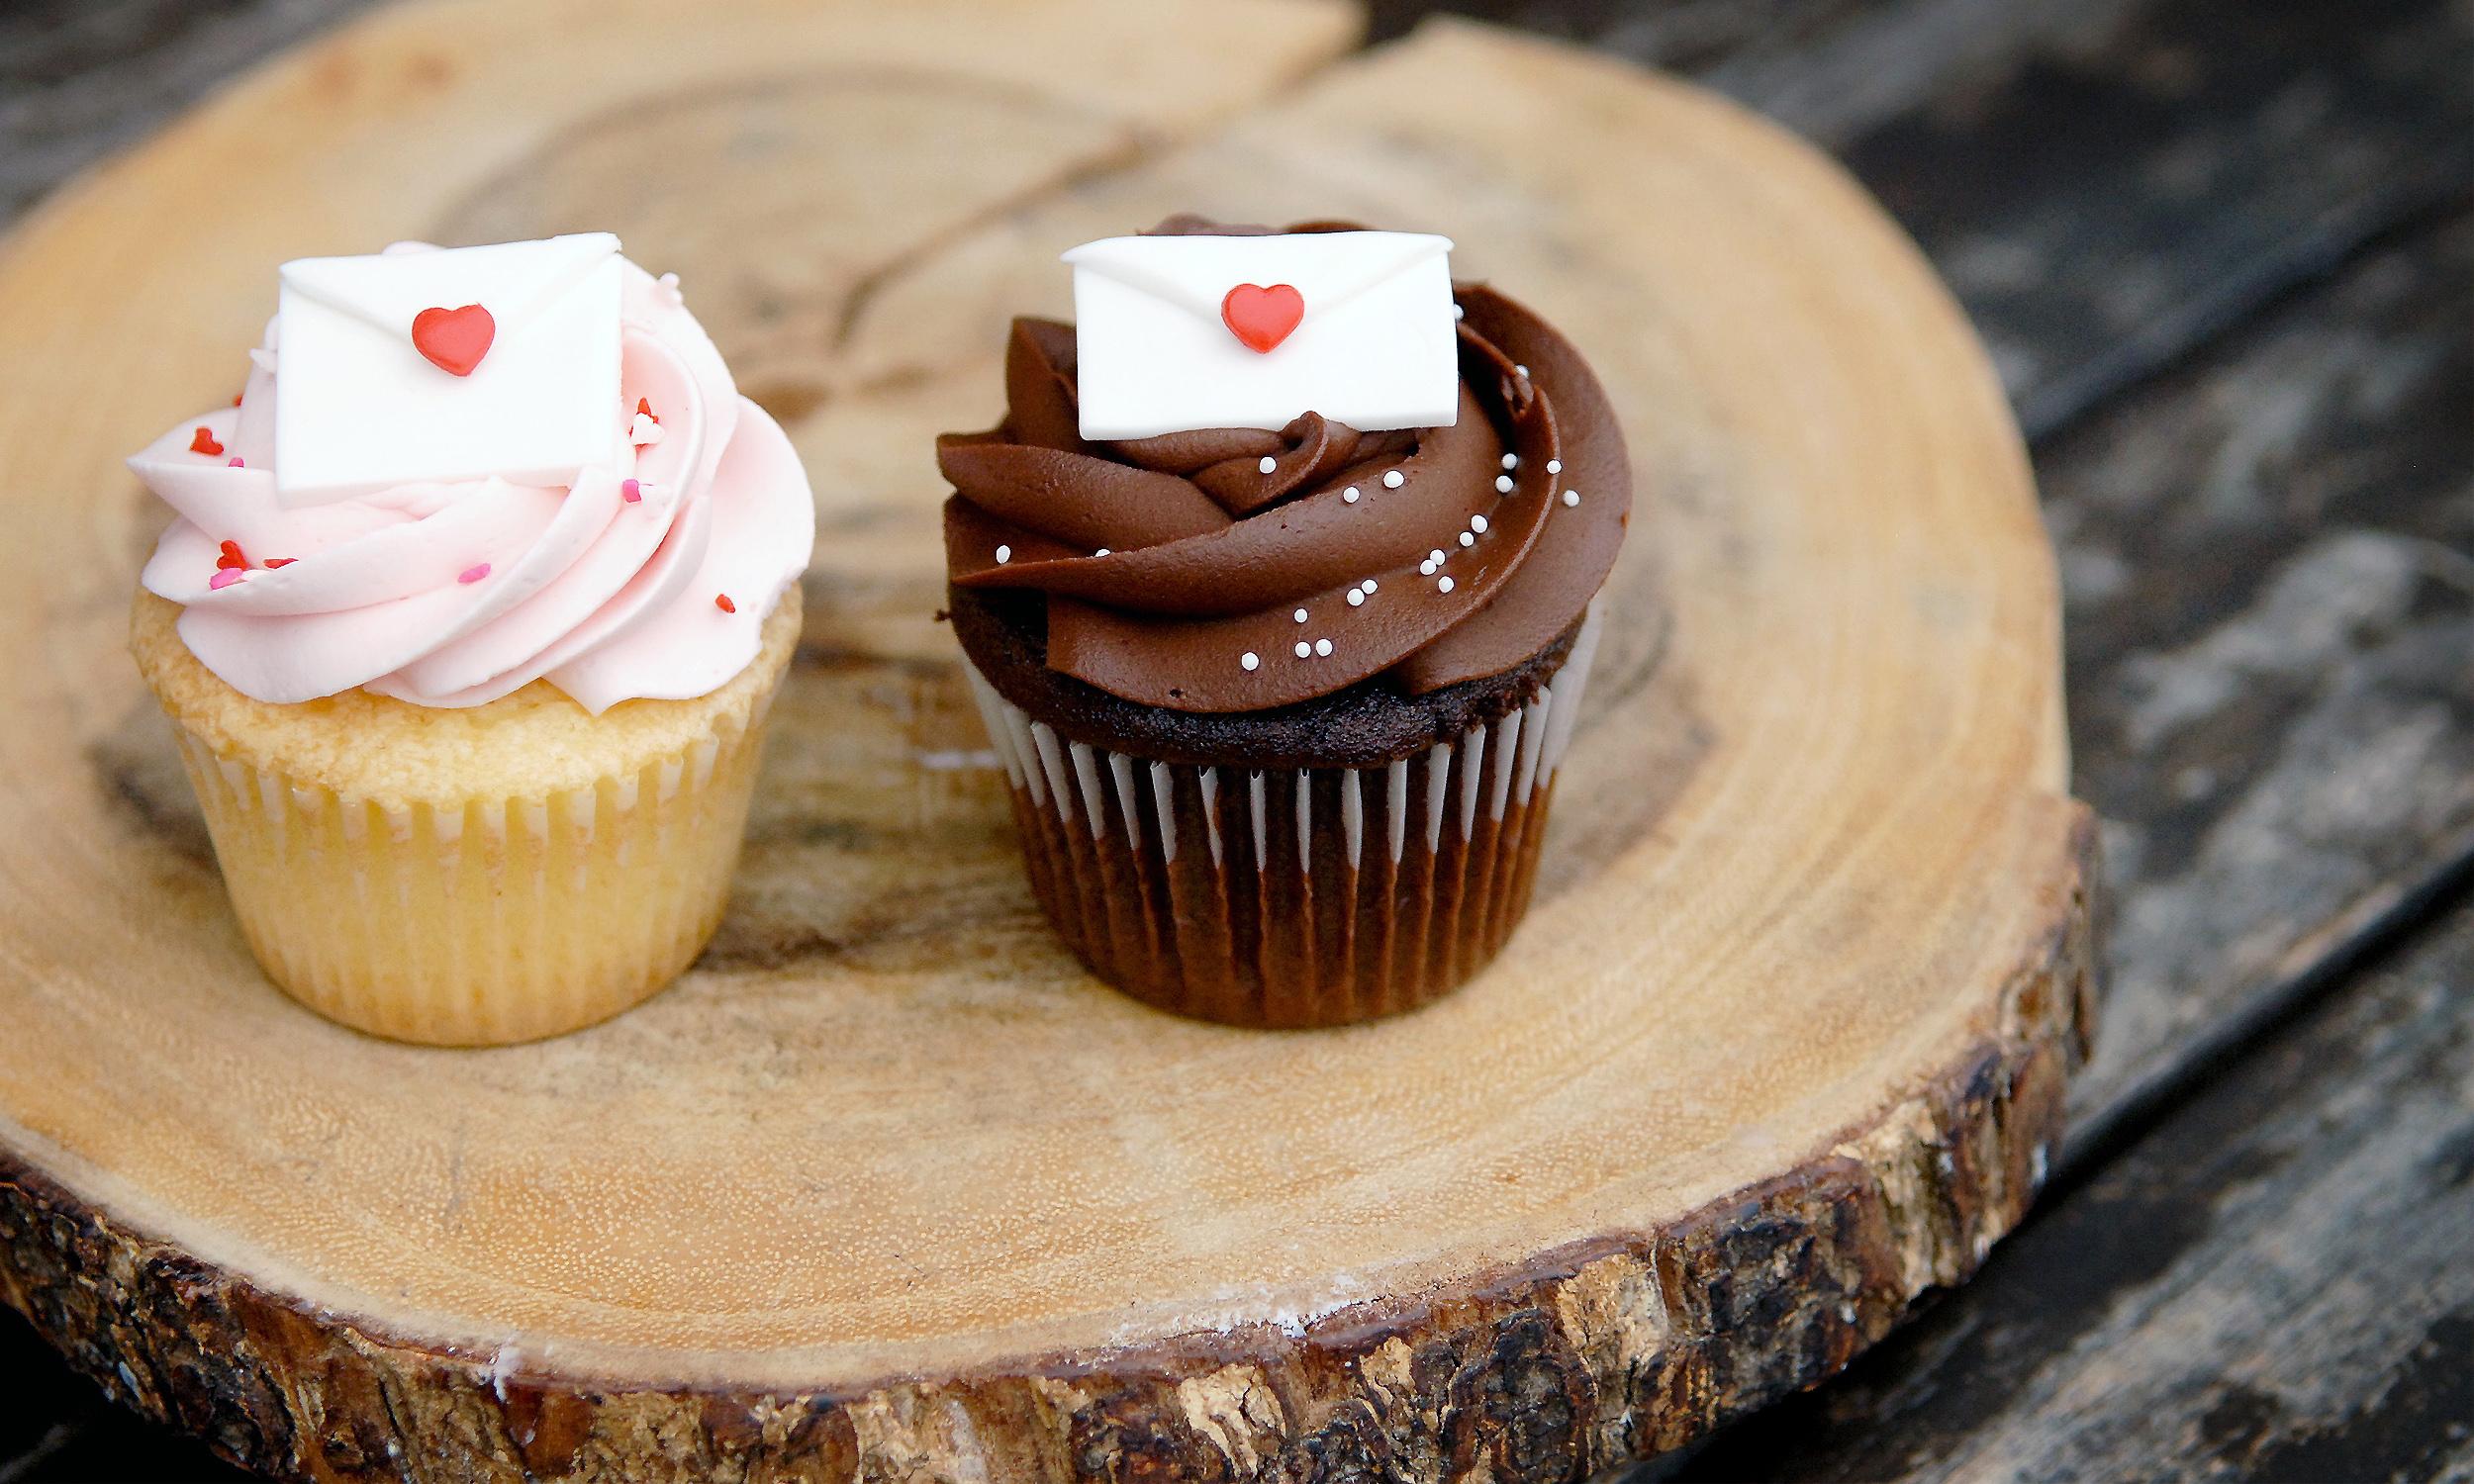 deco cupcakes 2.jpg